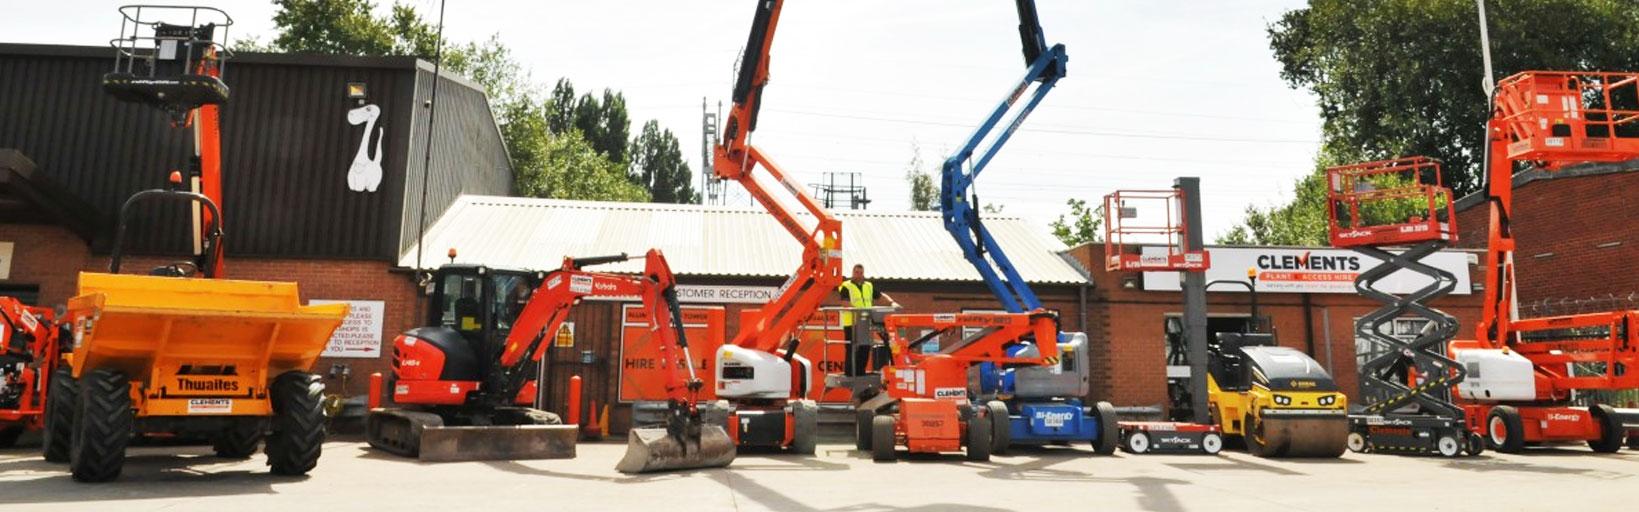 Clements Plant & Access Fuel Breakdowns – Eliminated